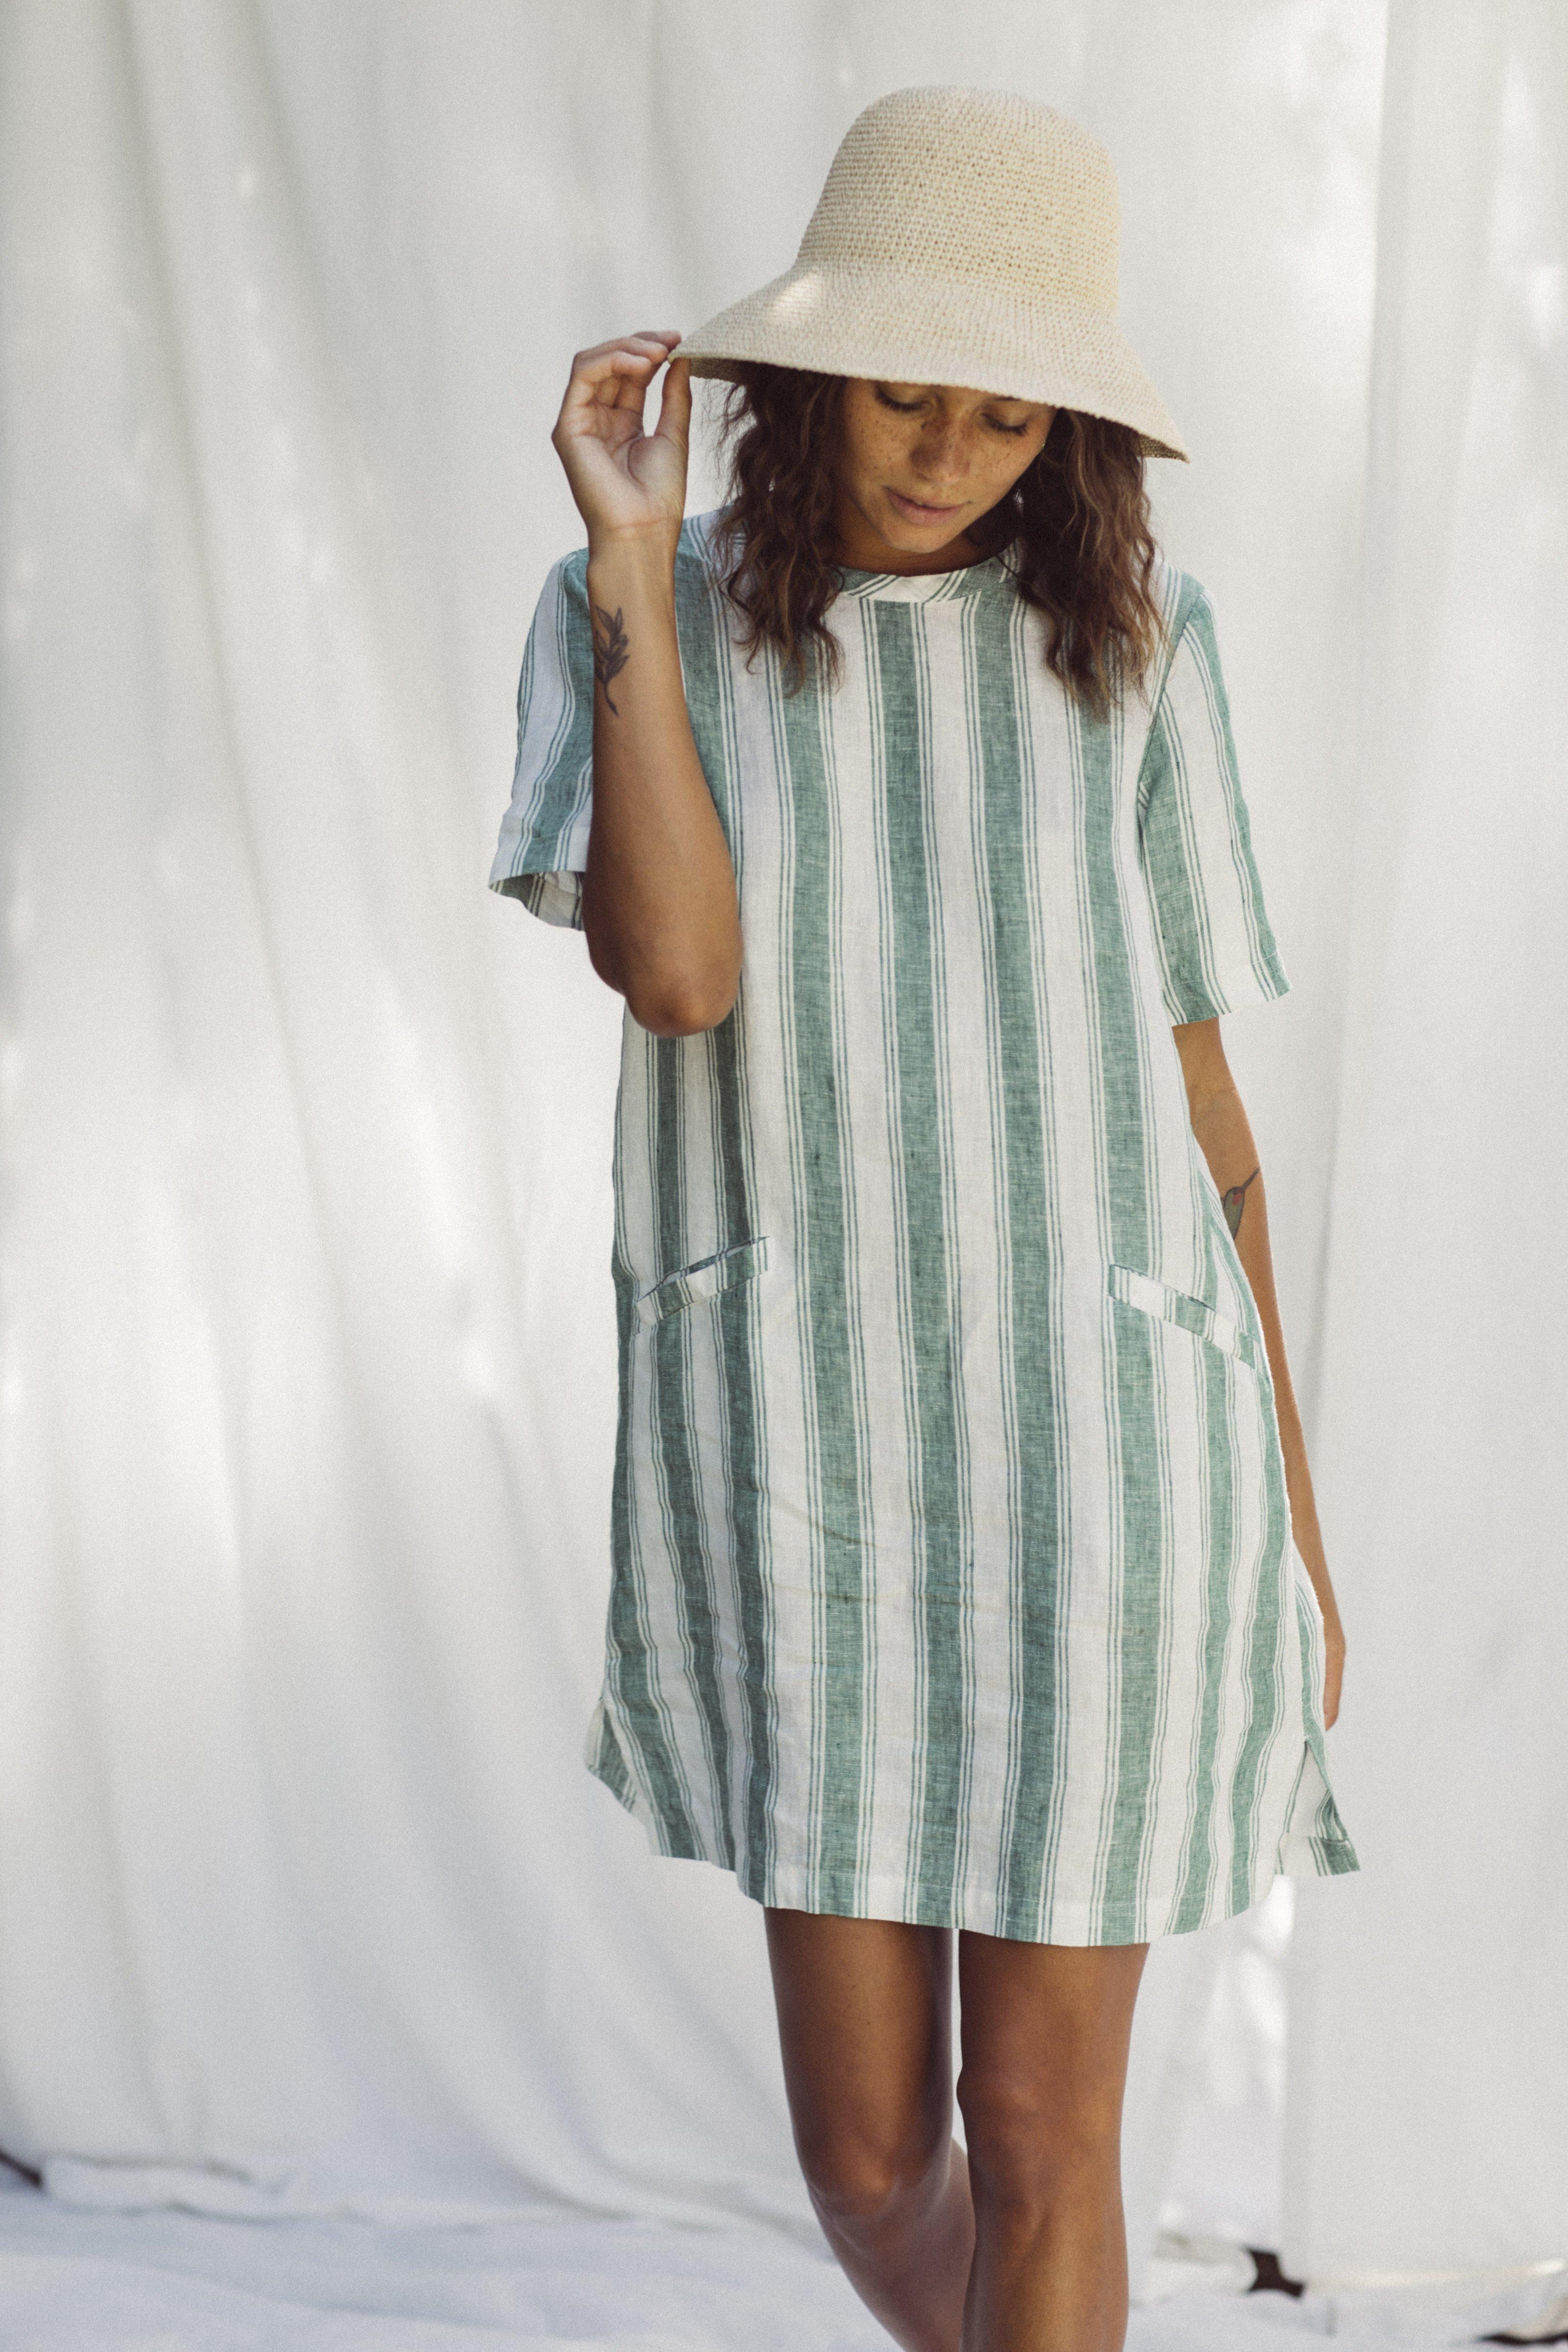 Raffiel Dress GREEN AWNING STRIPE by Trovata - 1